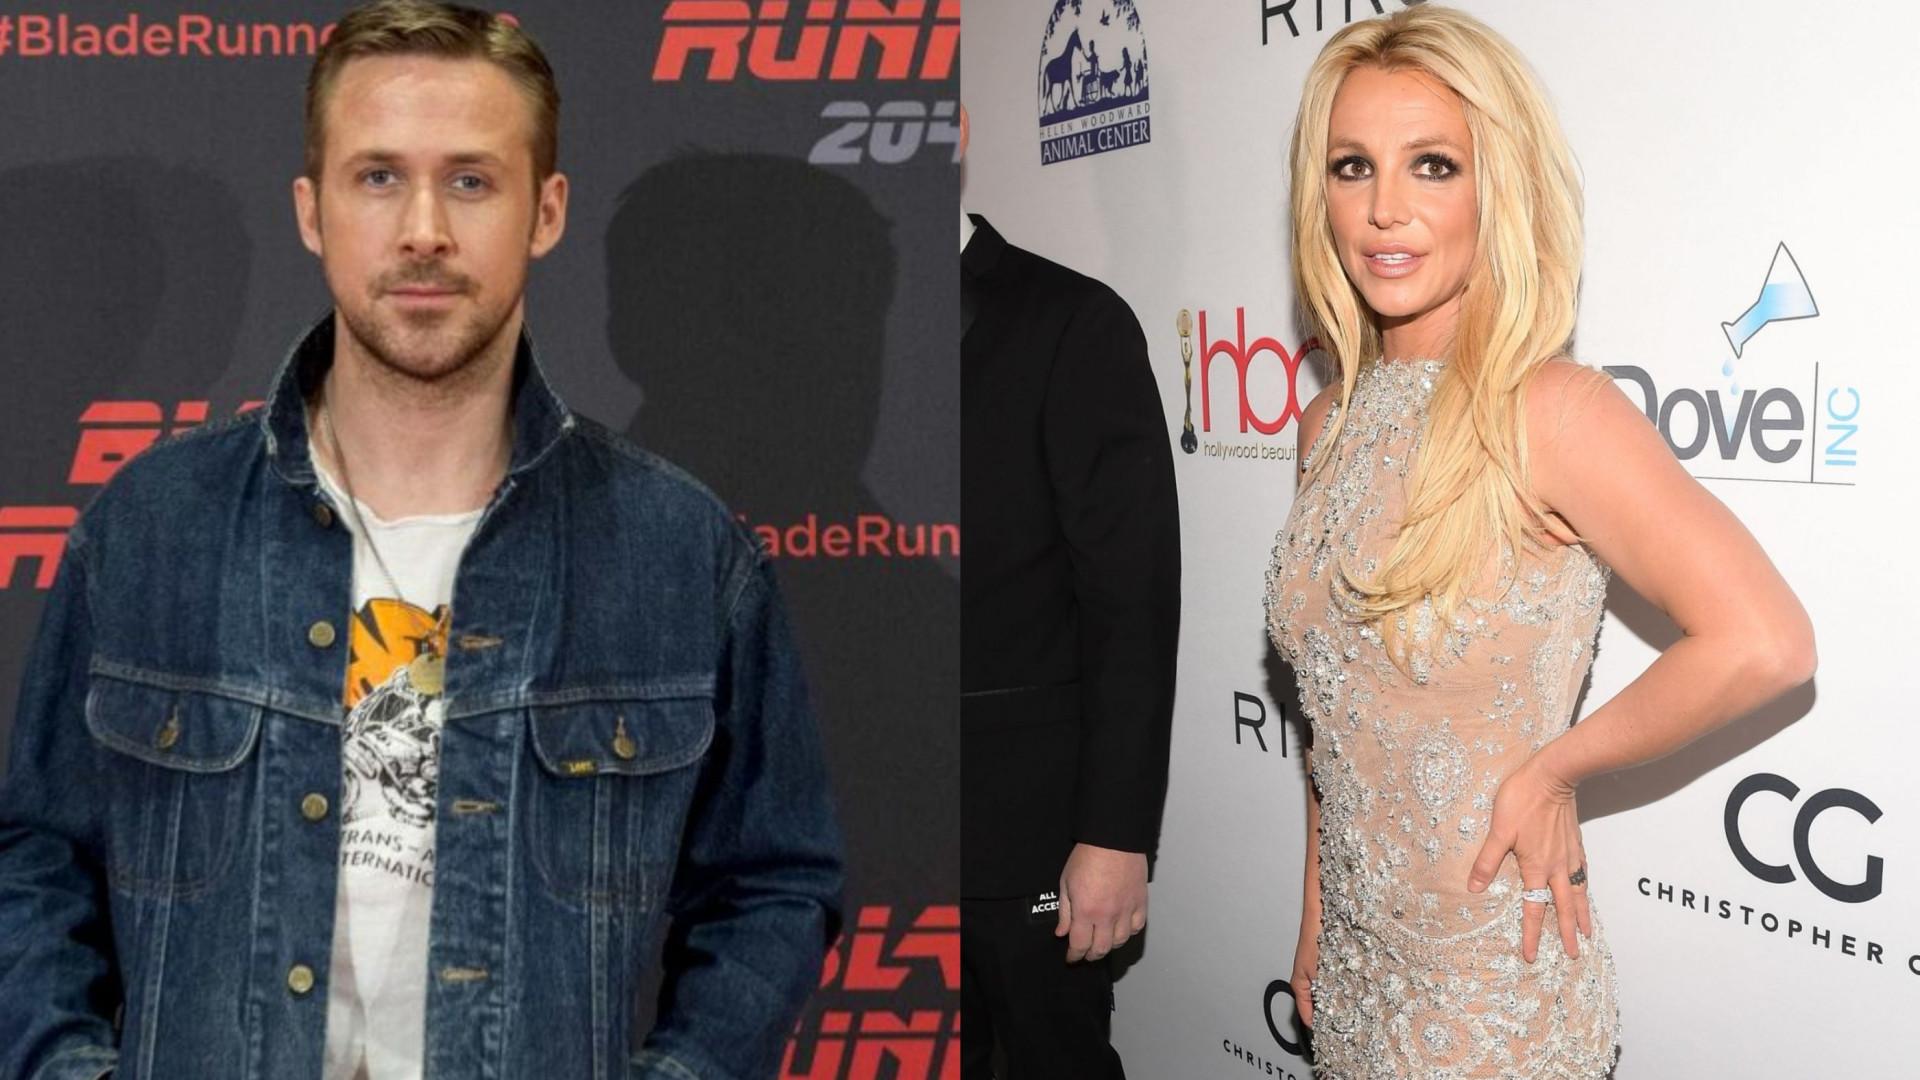 Ryan Gosling e Britney Spears reencontram-se após anos